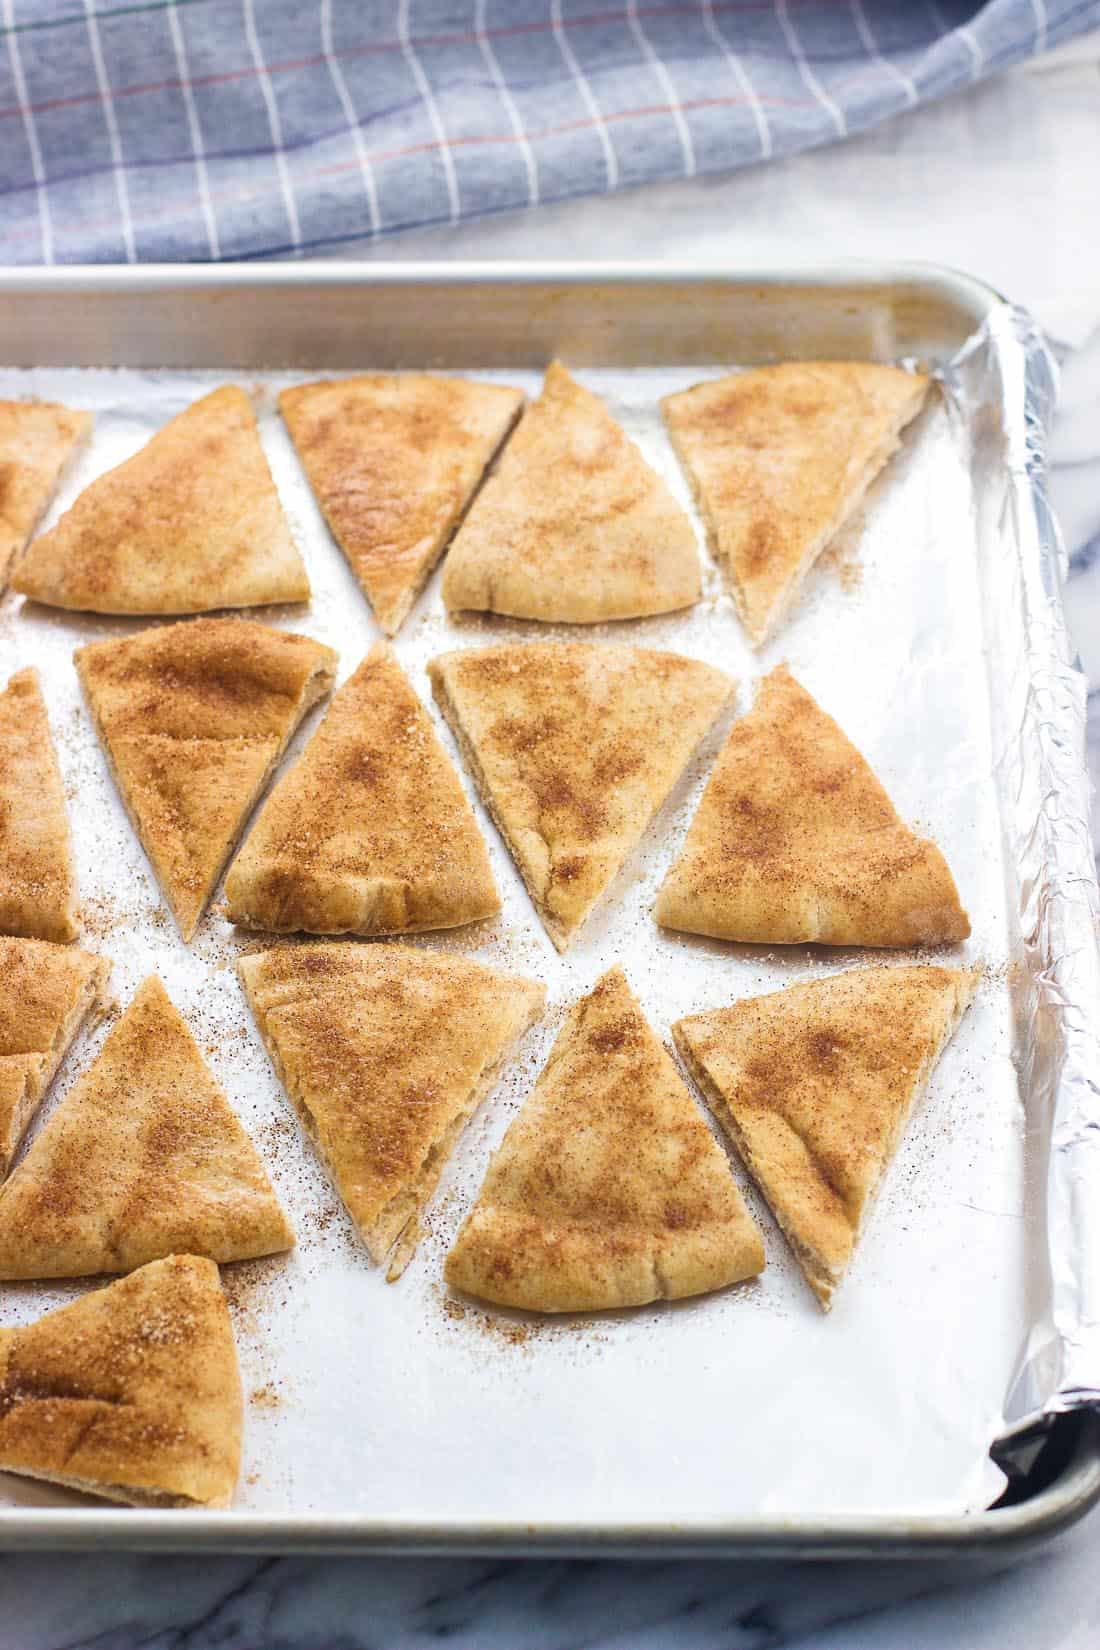 Sliced pita chips on a foil-lined baking sheet pre-bake